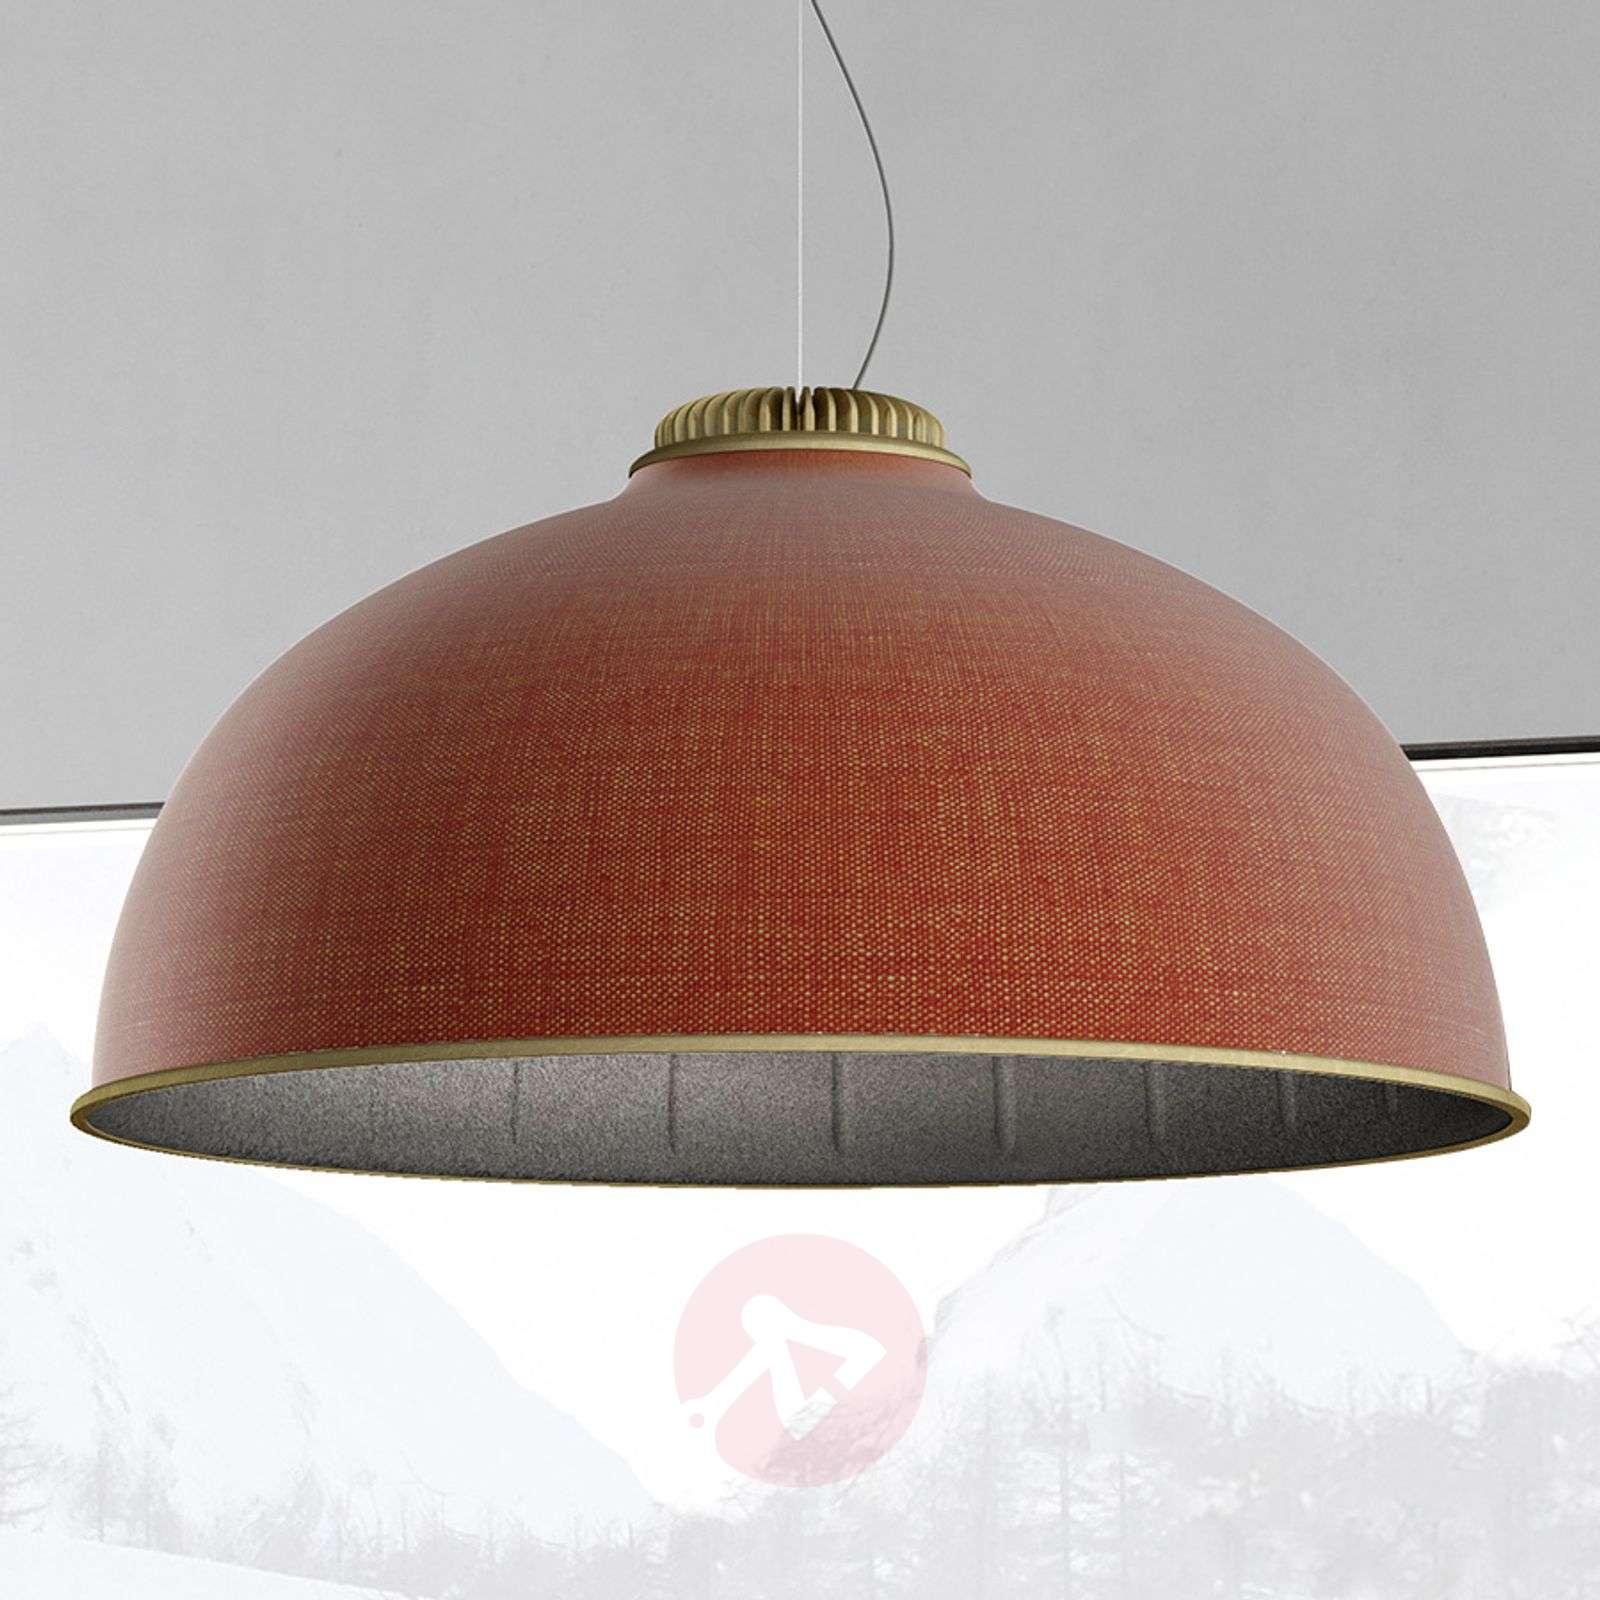 Luceplan Farel LED-riippuvalaisin-6030214X-01